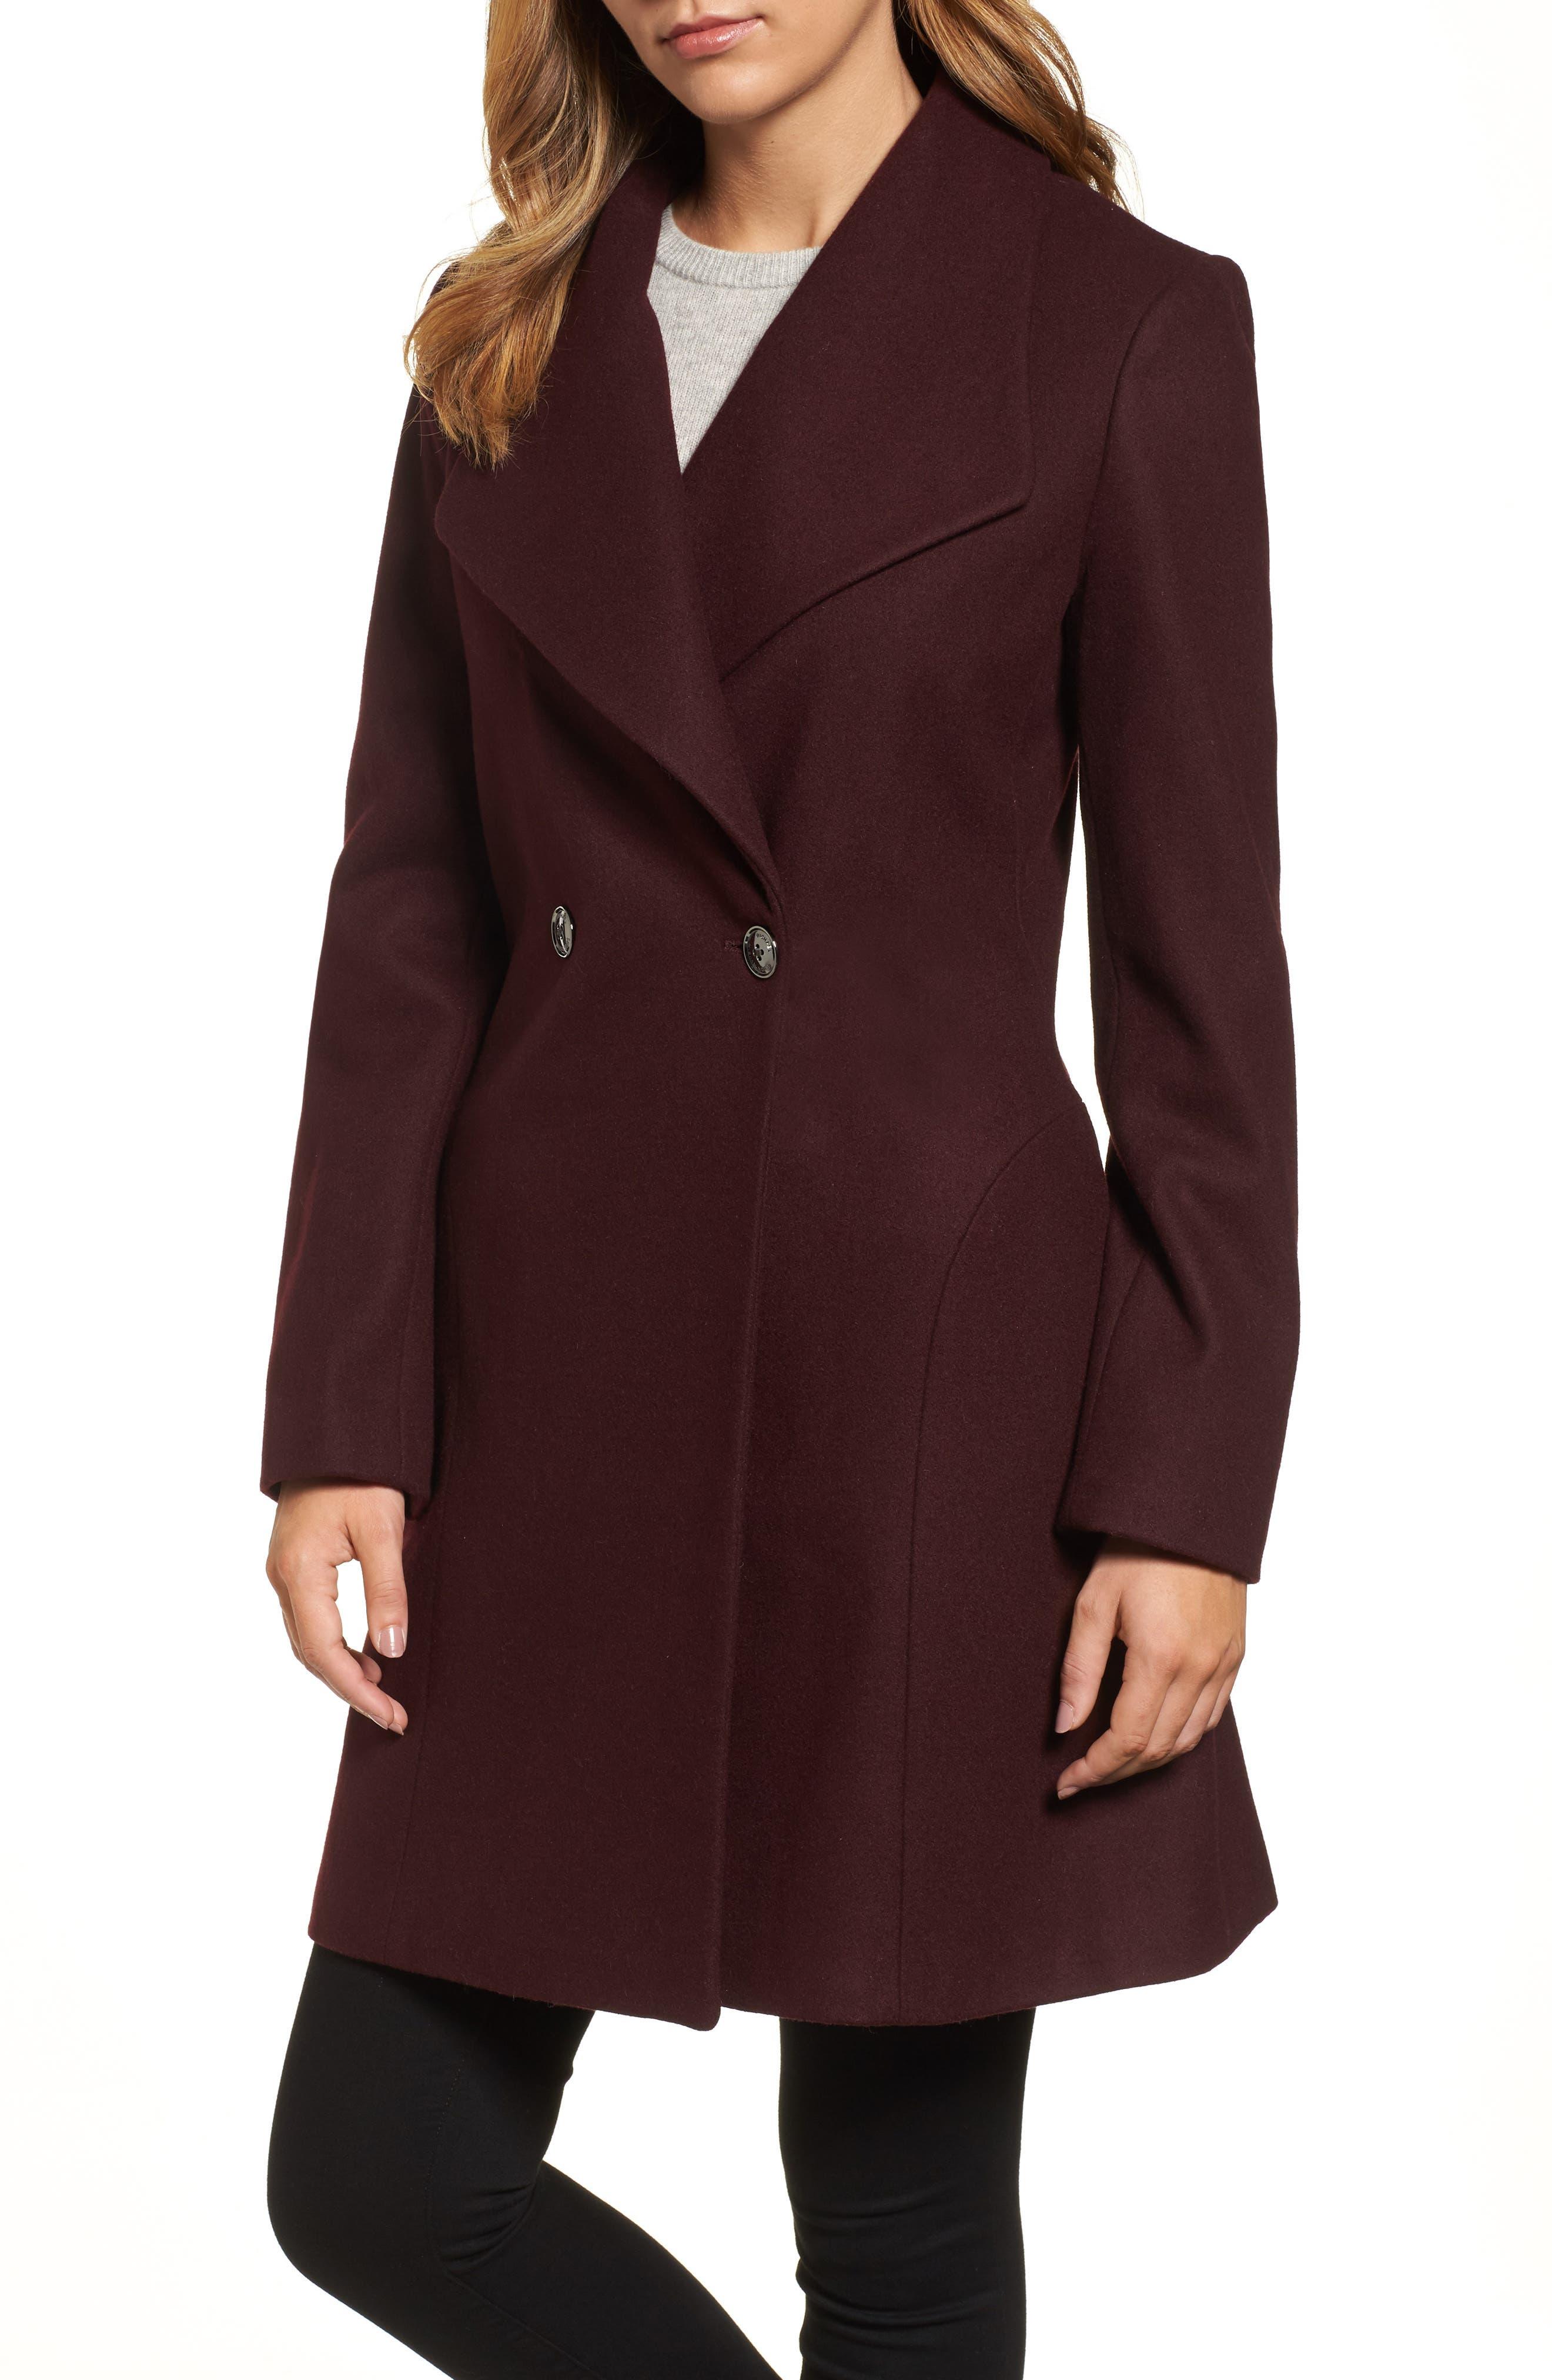 MICHAEL Michael Kors Missy Double Breasted Wool Blend Swing Coat